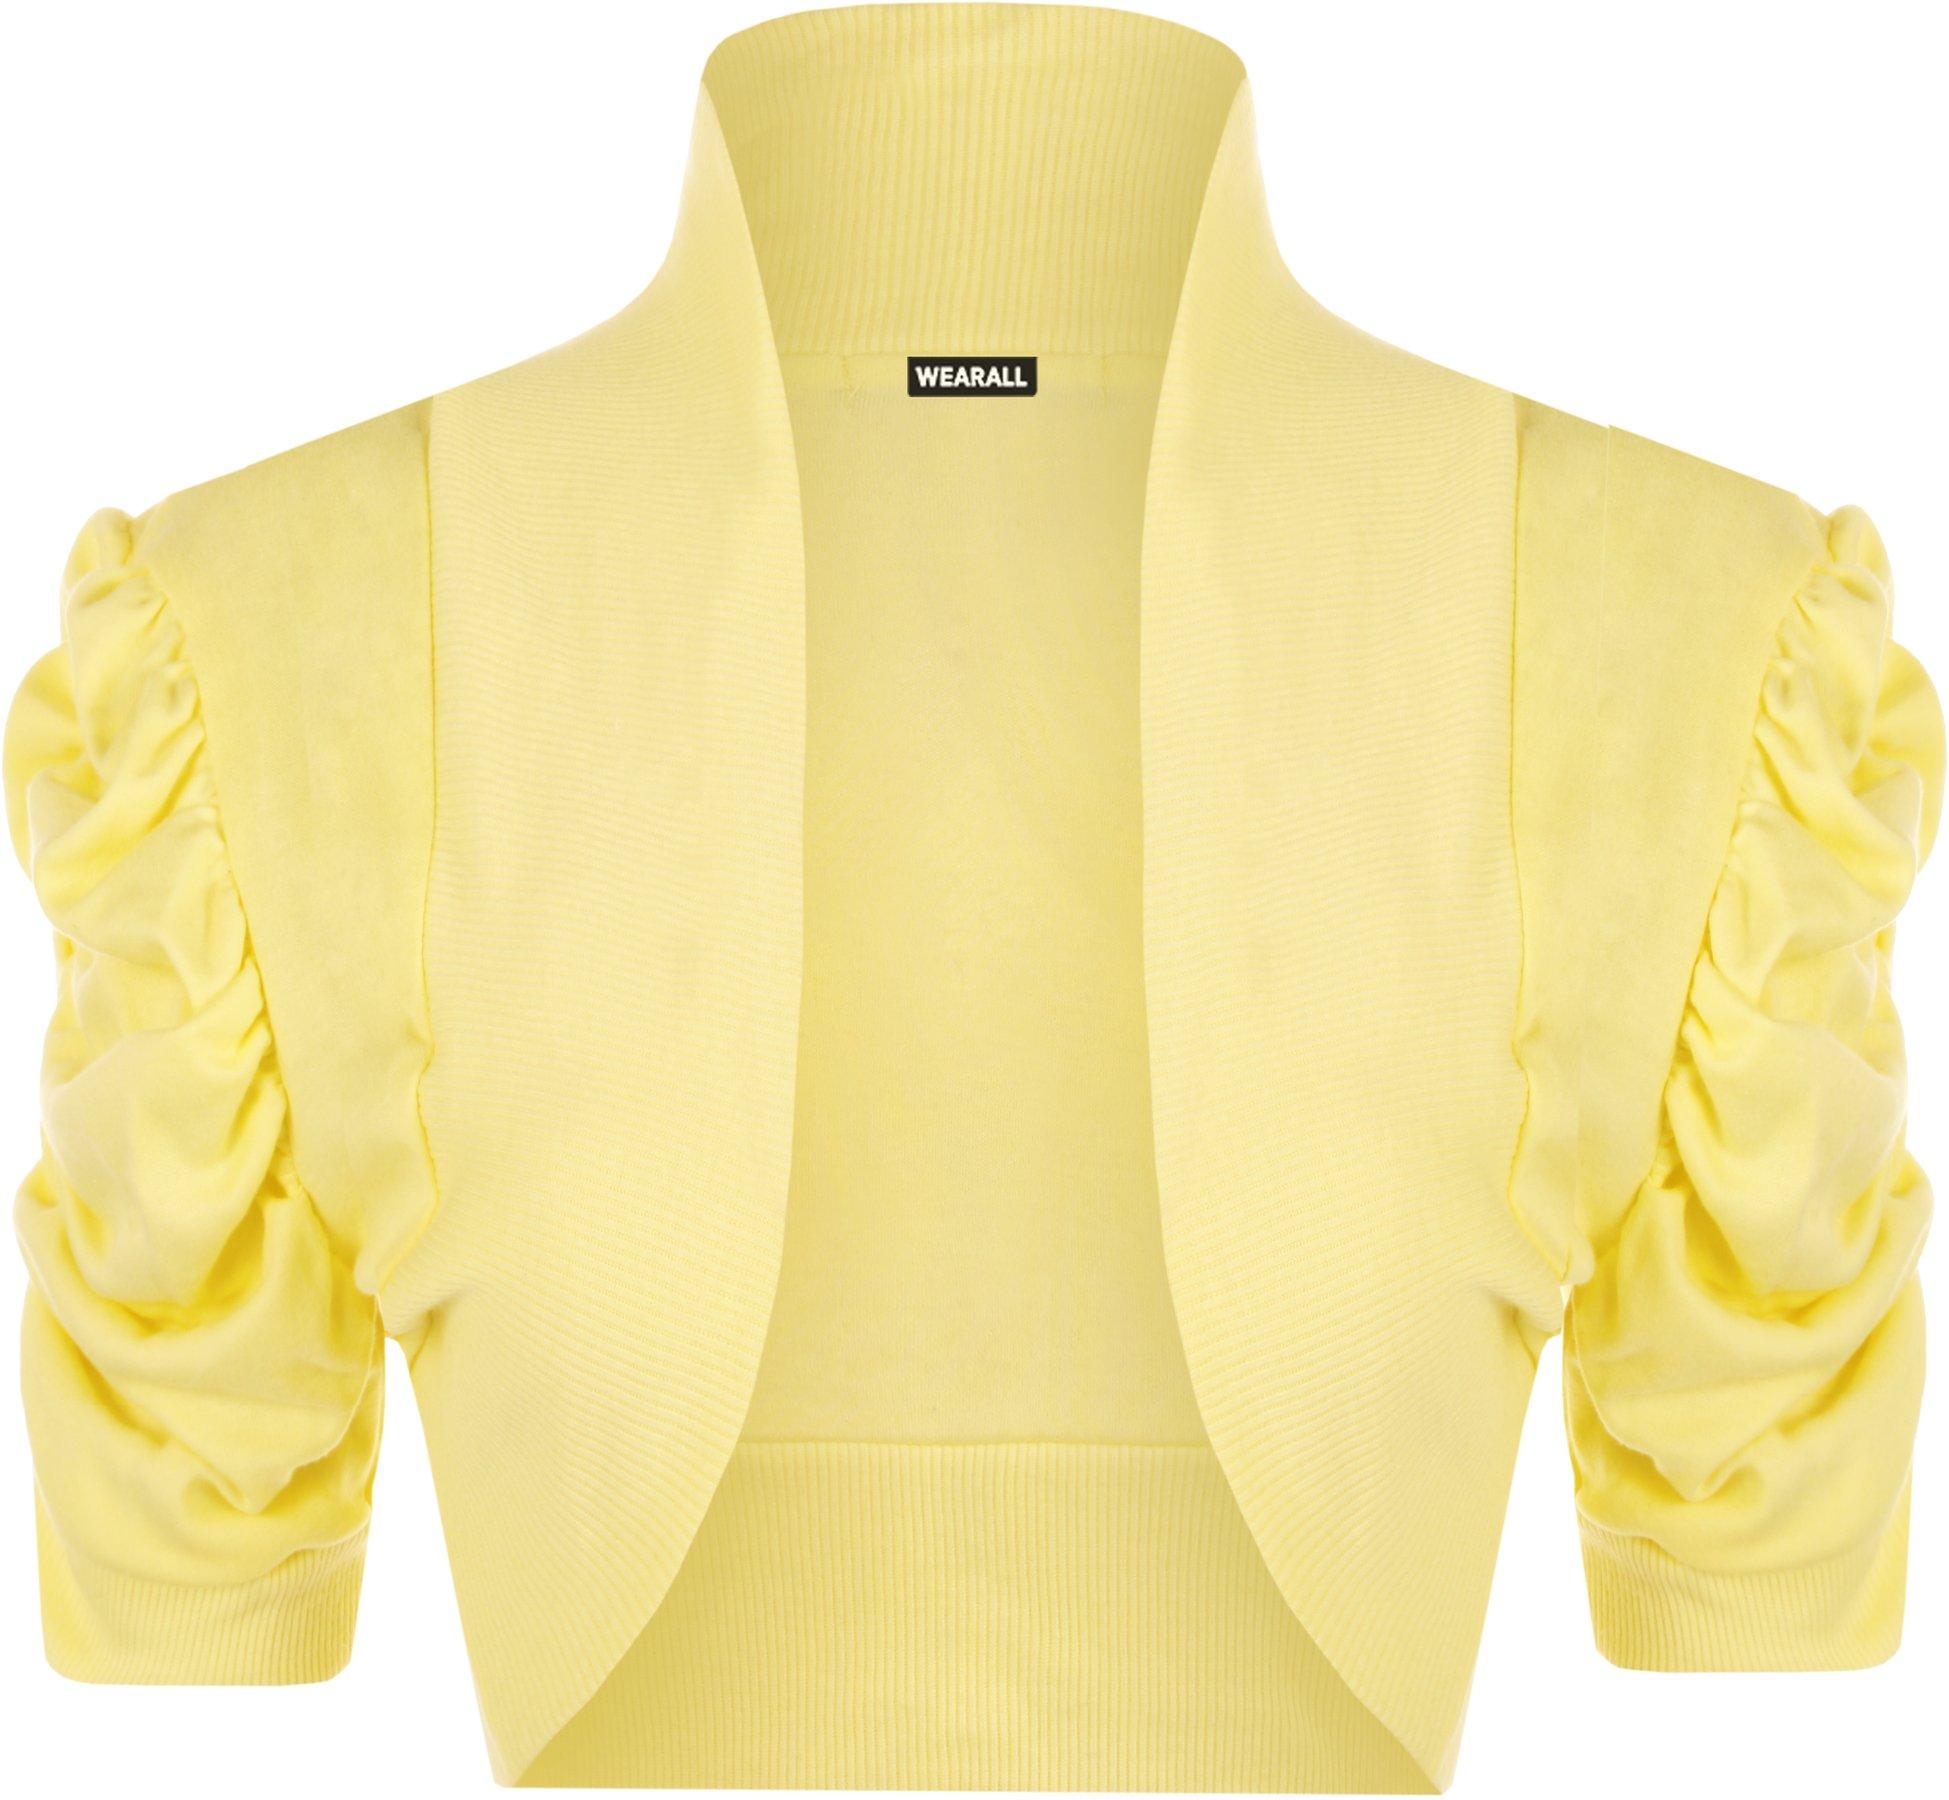 WearAll Women's Shrug Top Ladies Short Sleeve Bolero - Yellow - US 8-10 (UK 12-14)